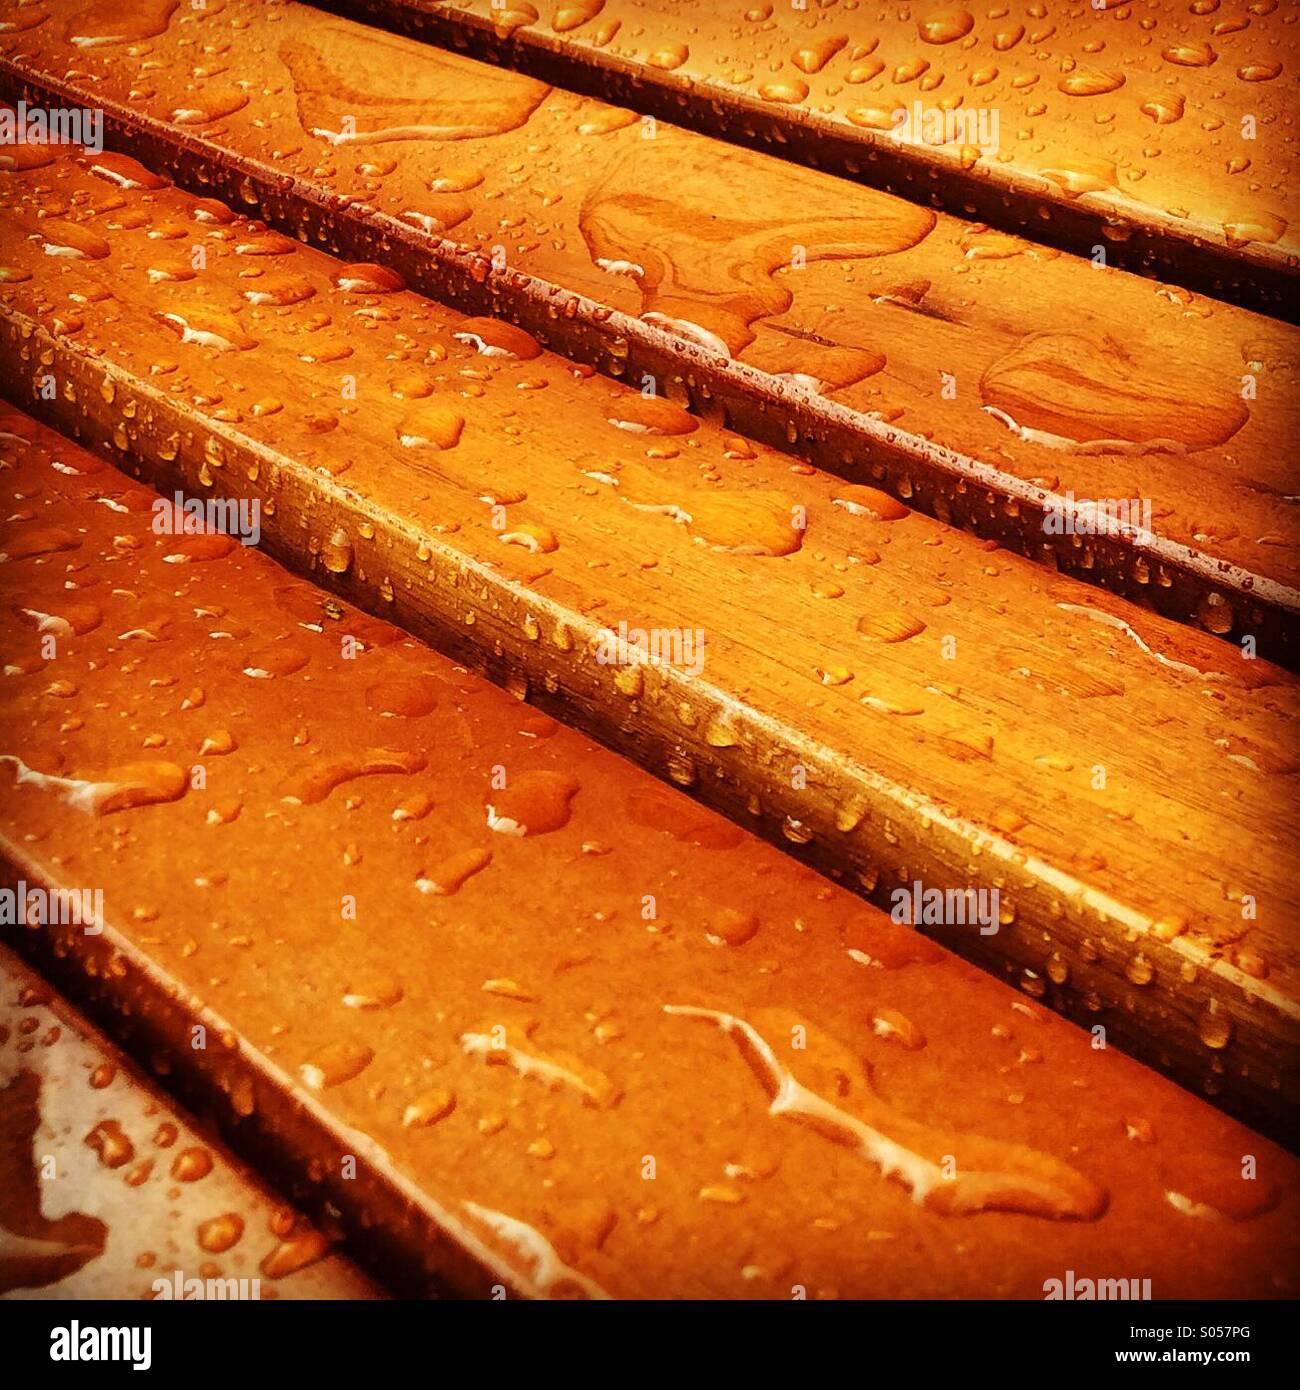 Rain on varnished wood - Stock Image